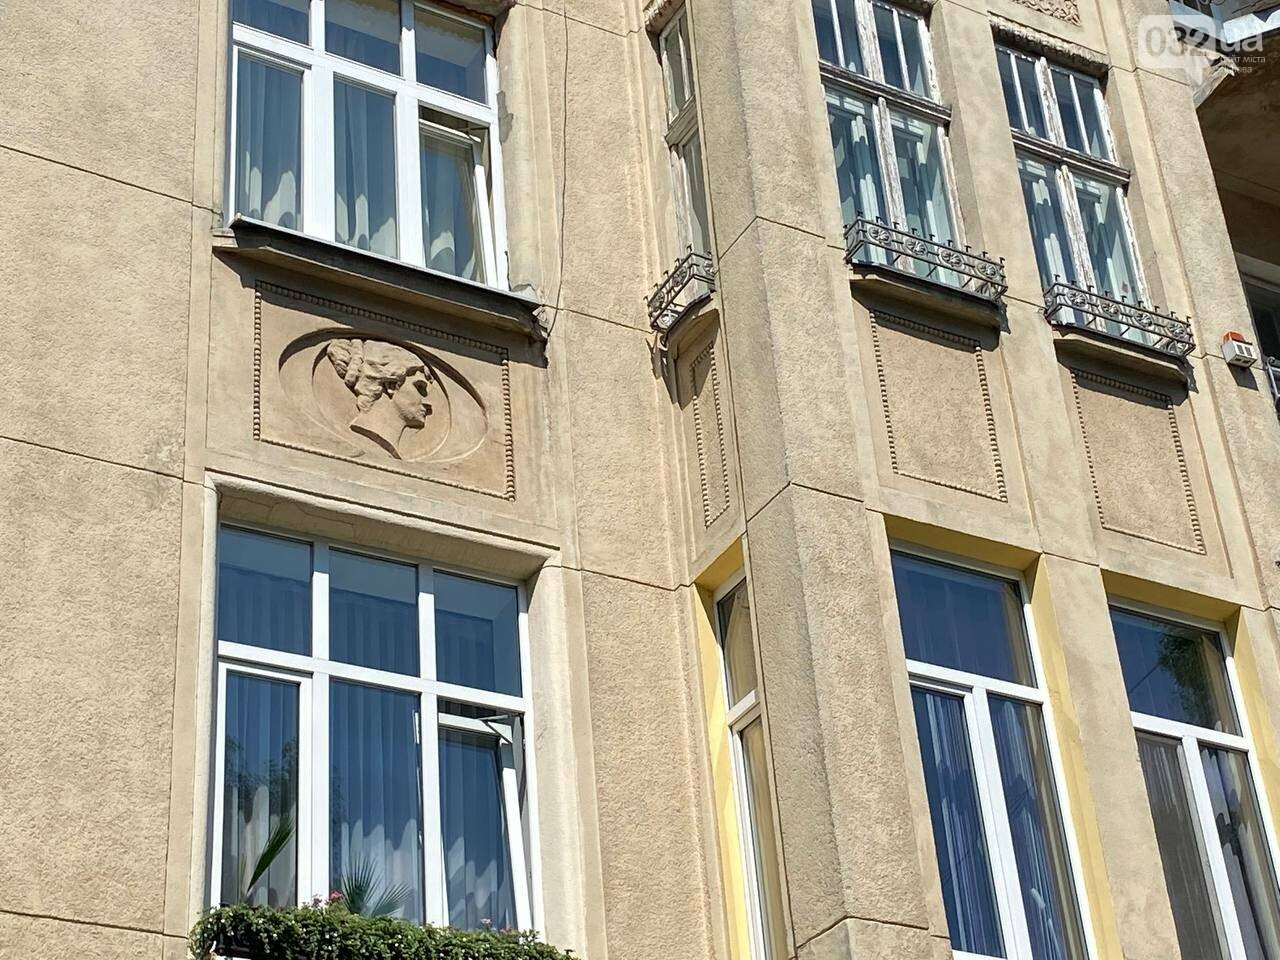 Будівлі на вул. Конопницької, Фото: 032.ua